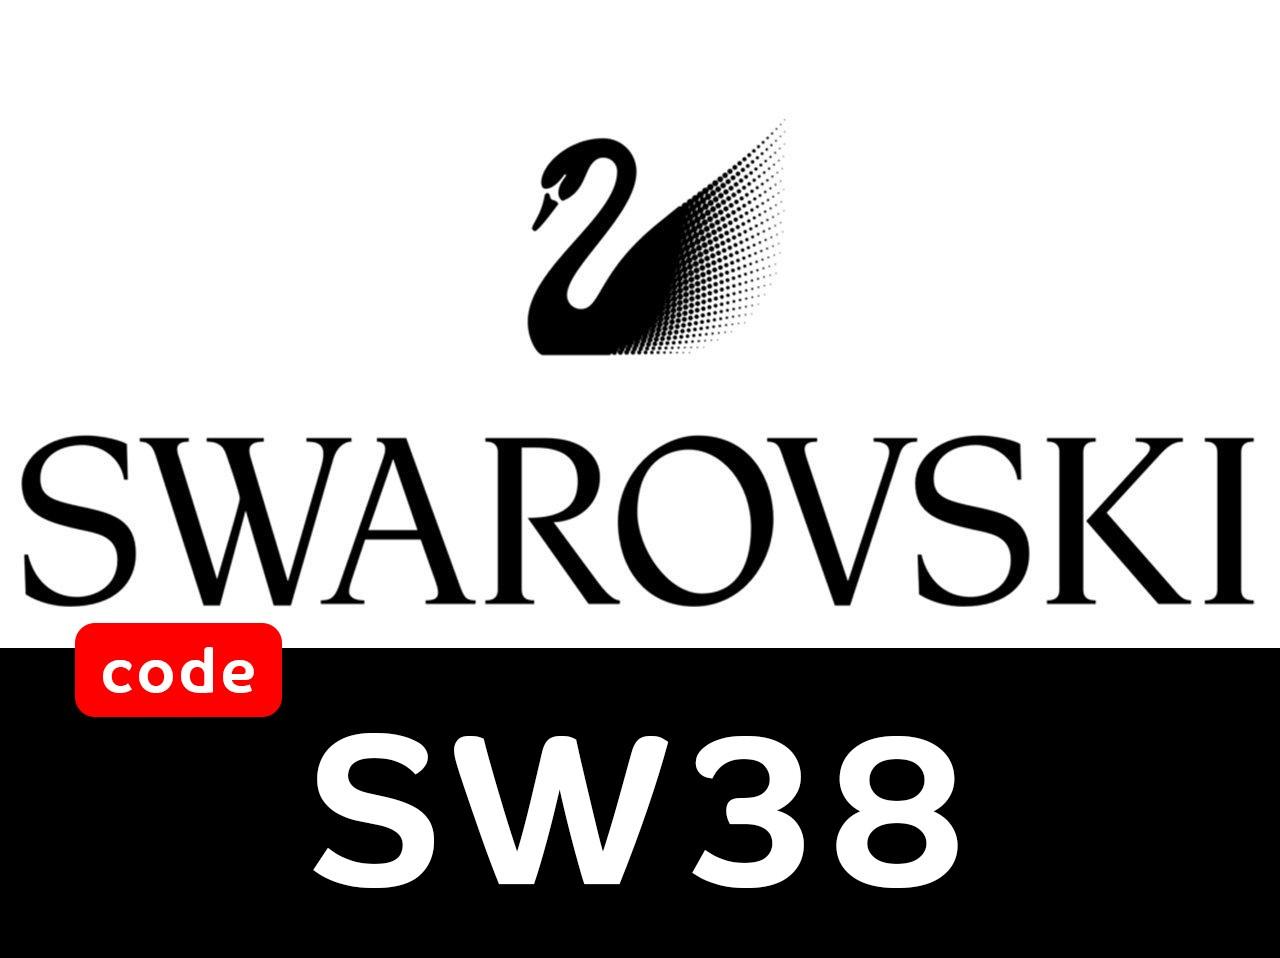 swarovski coupon 2021